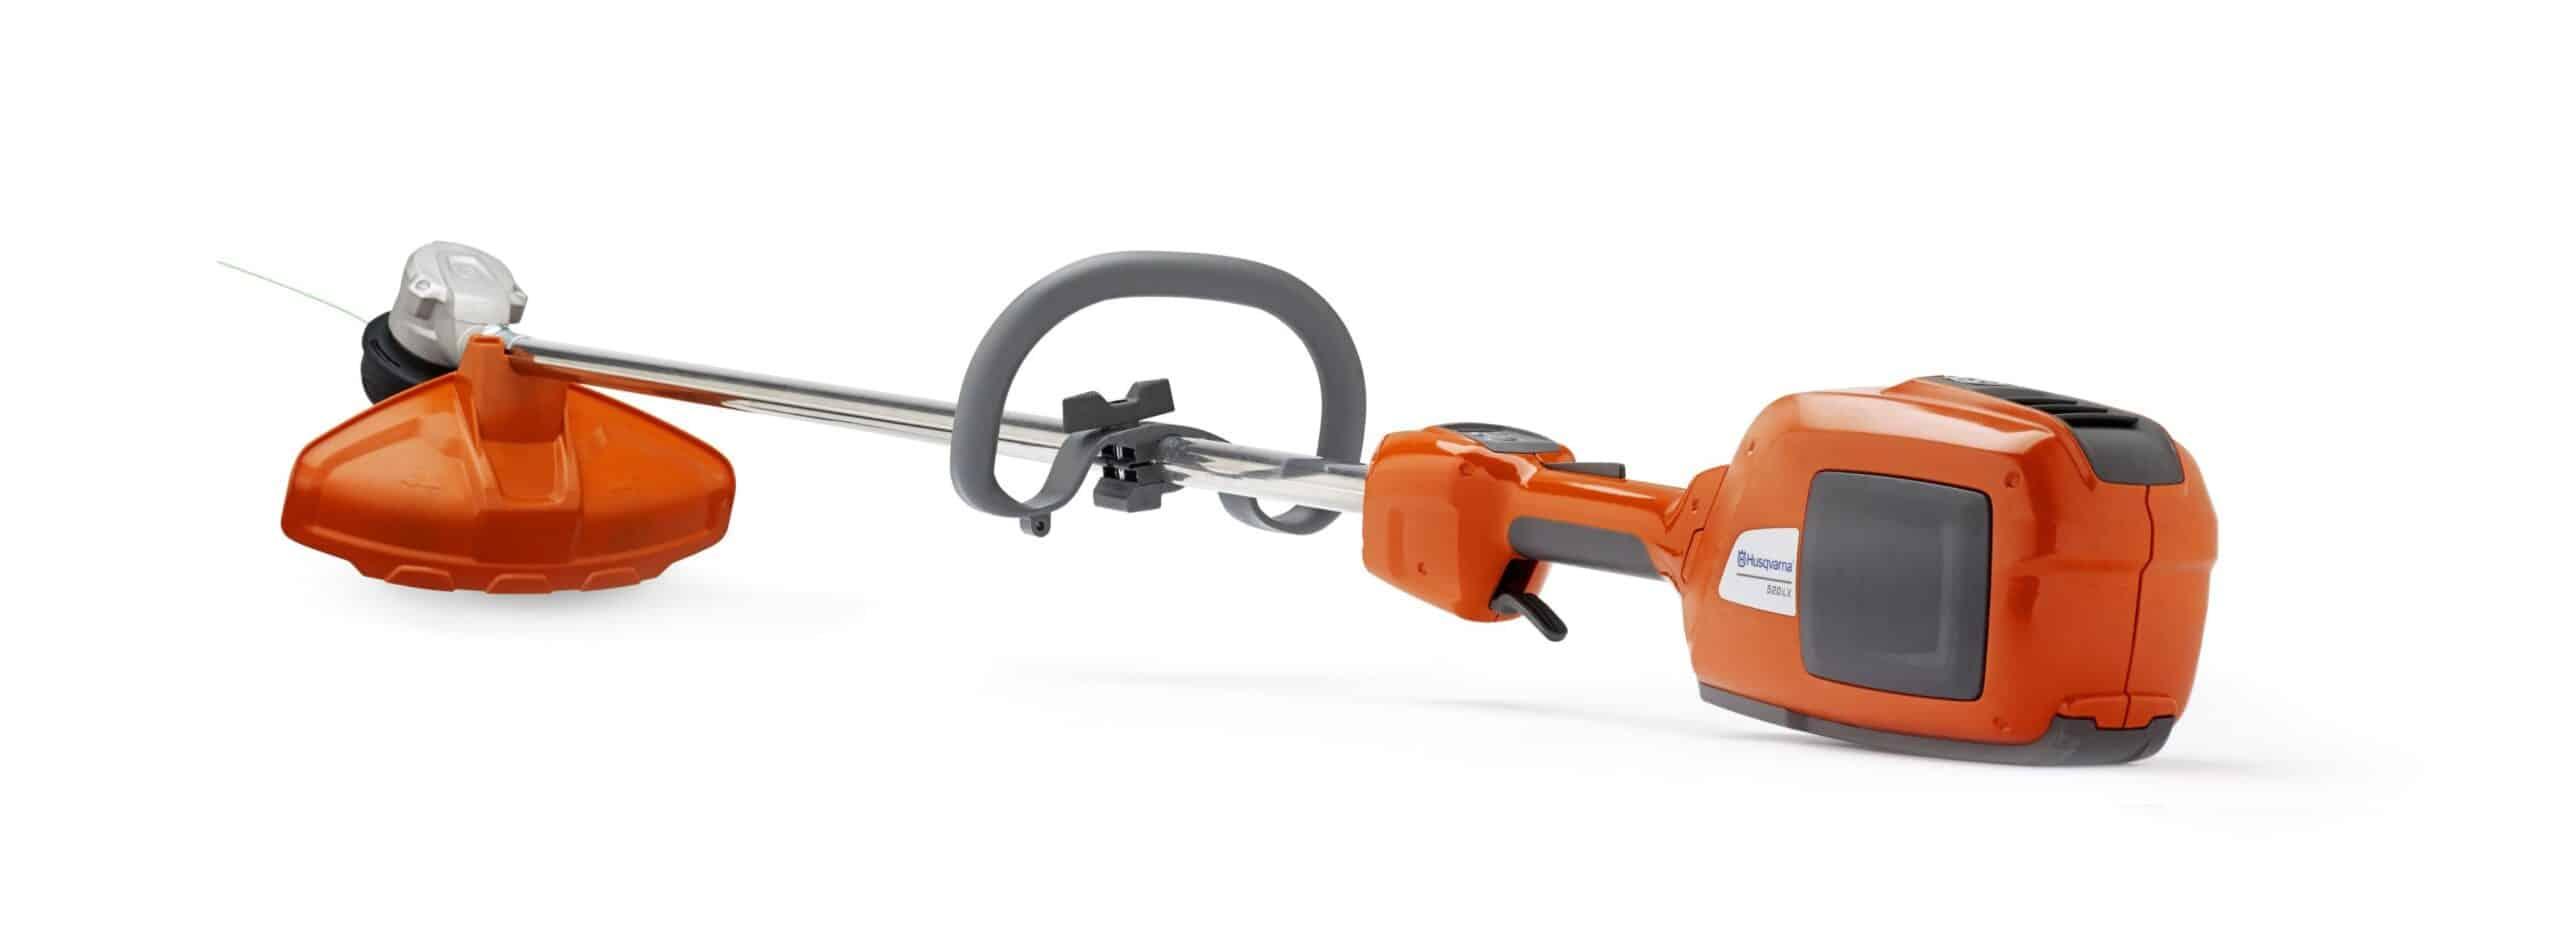 Husqvarna 520iLX Battery Brushcutter